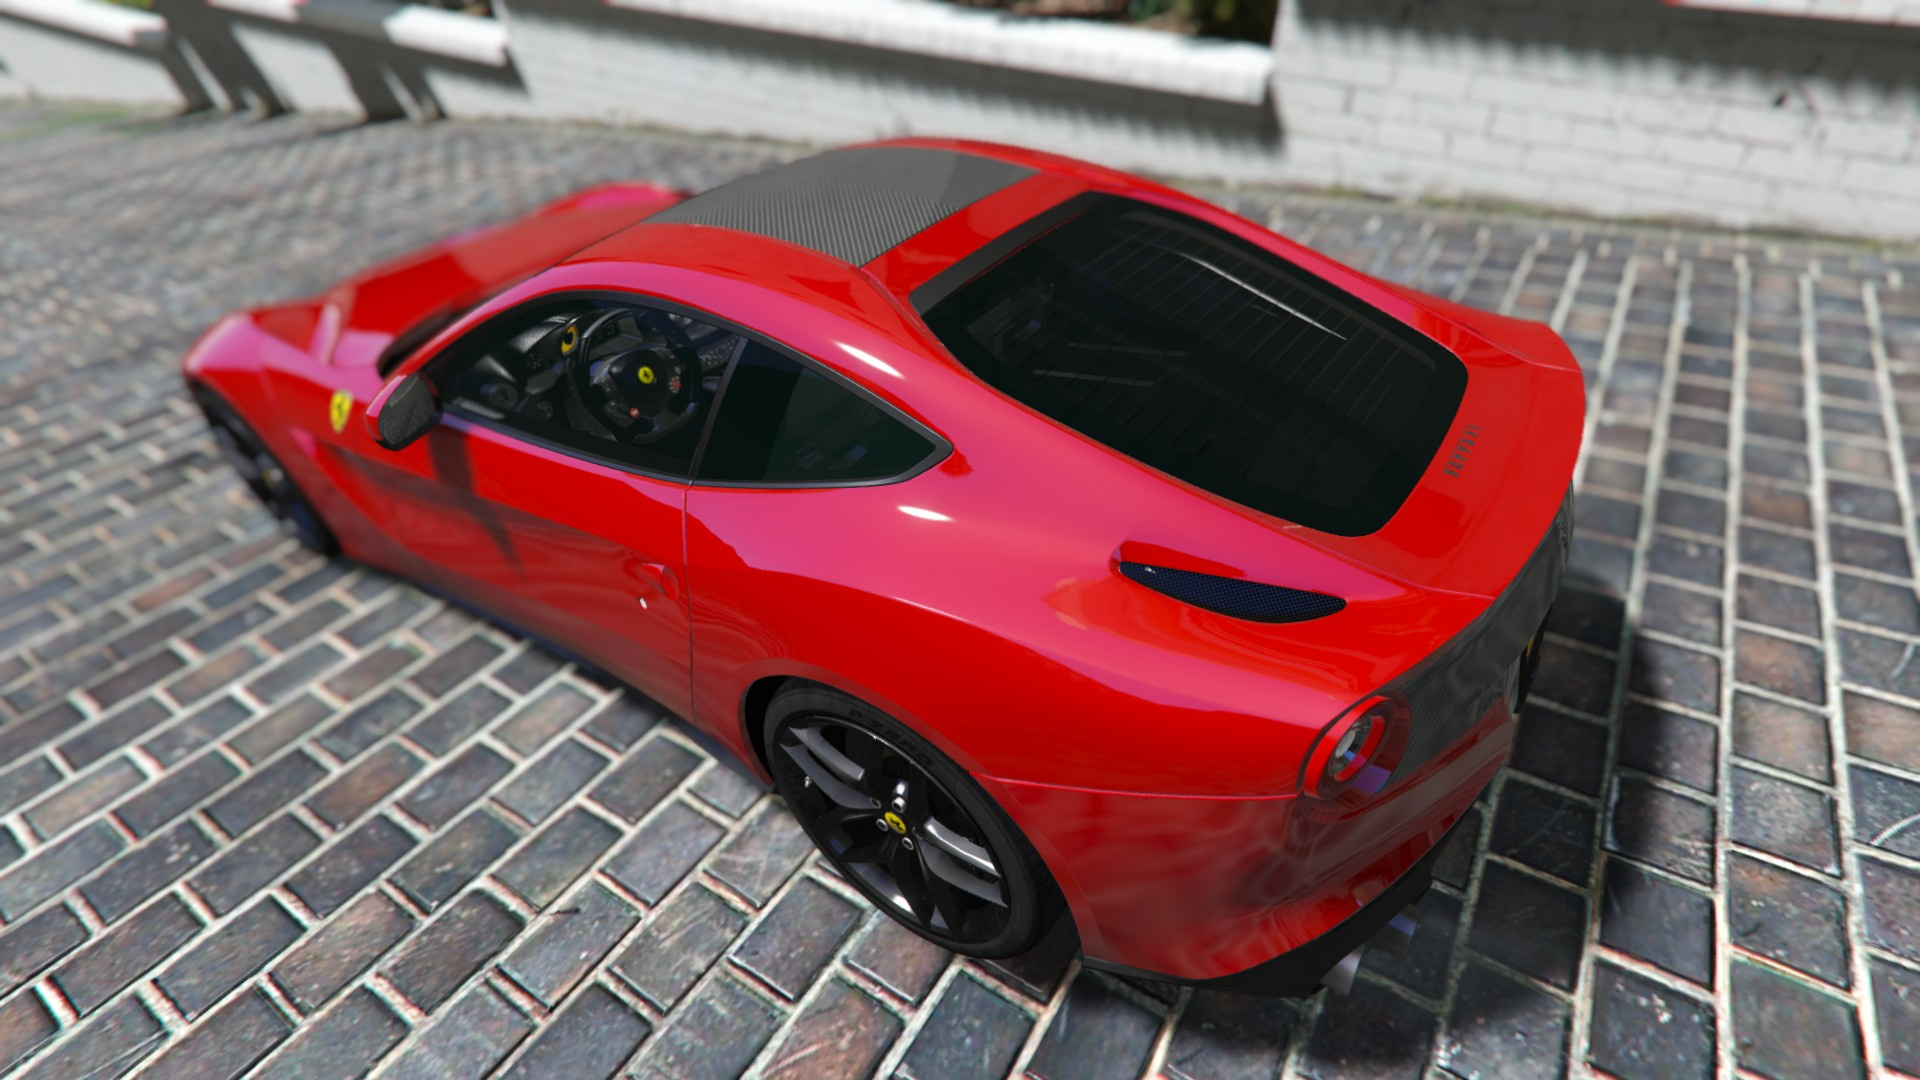 ferrari f12 berlinetta 2013 yca oakley design 2 more pj\u0027s gta5794cd4 gta5 2017 03 01 15 07 56